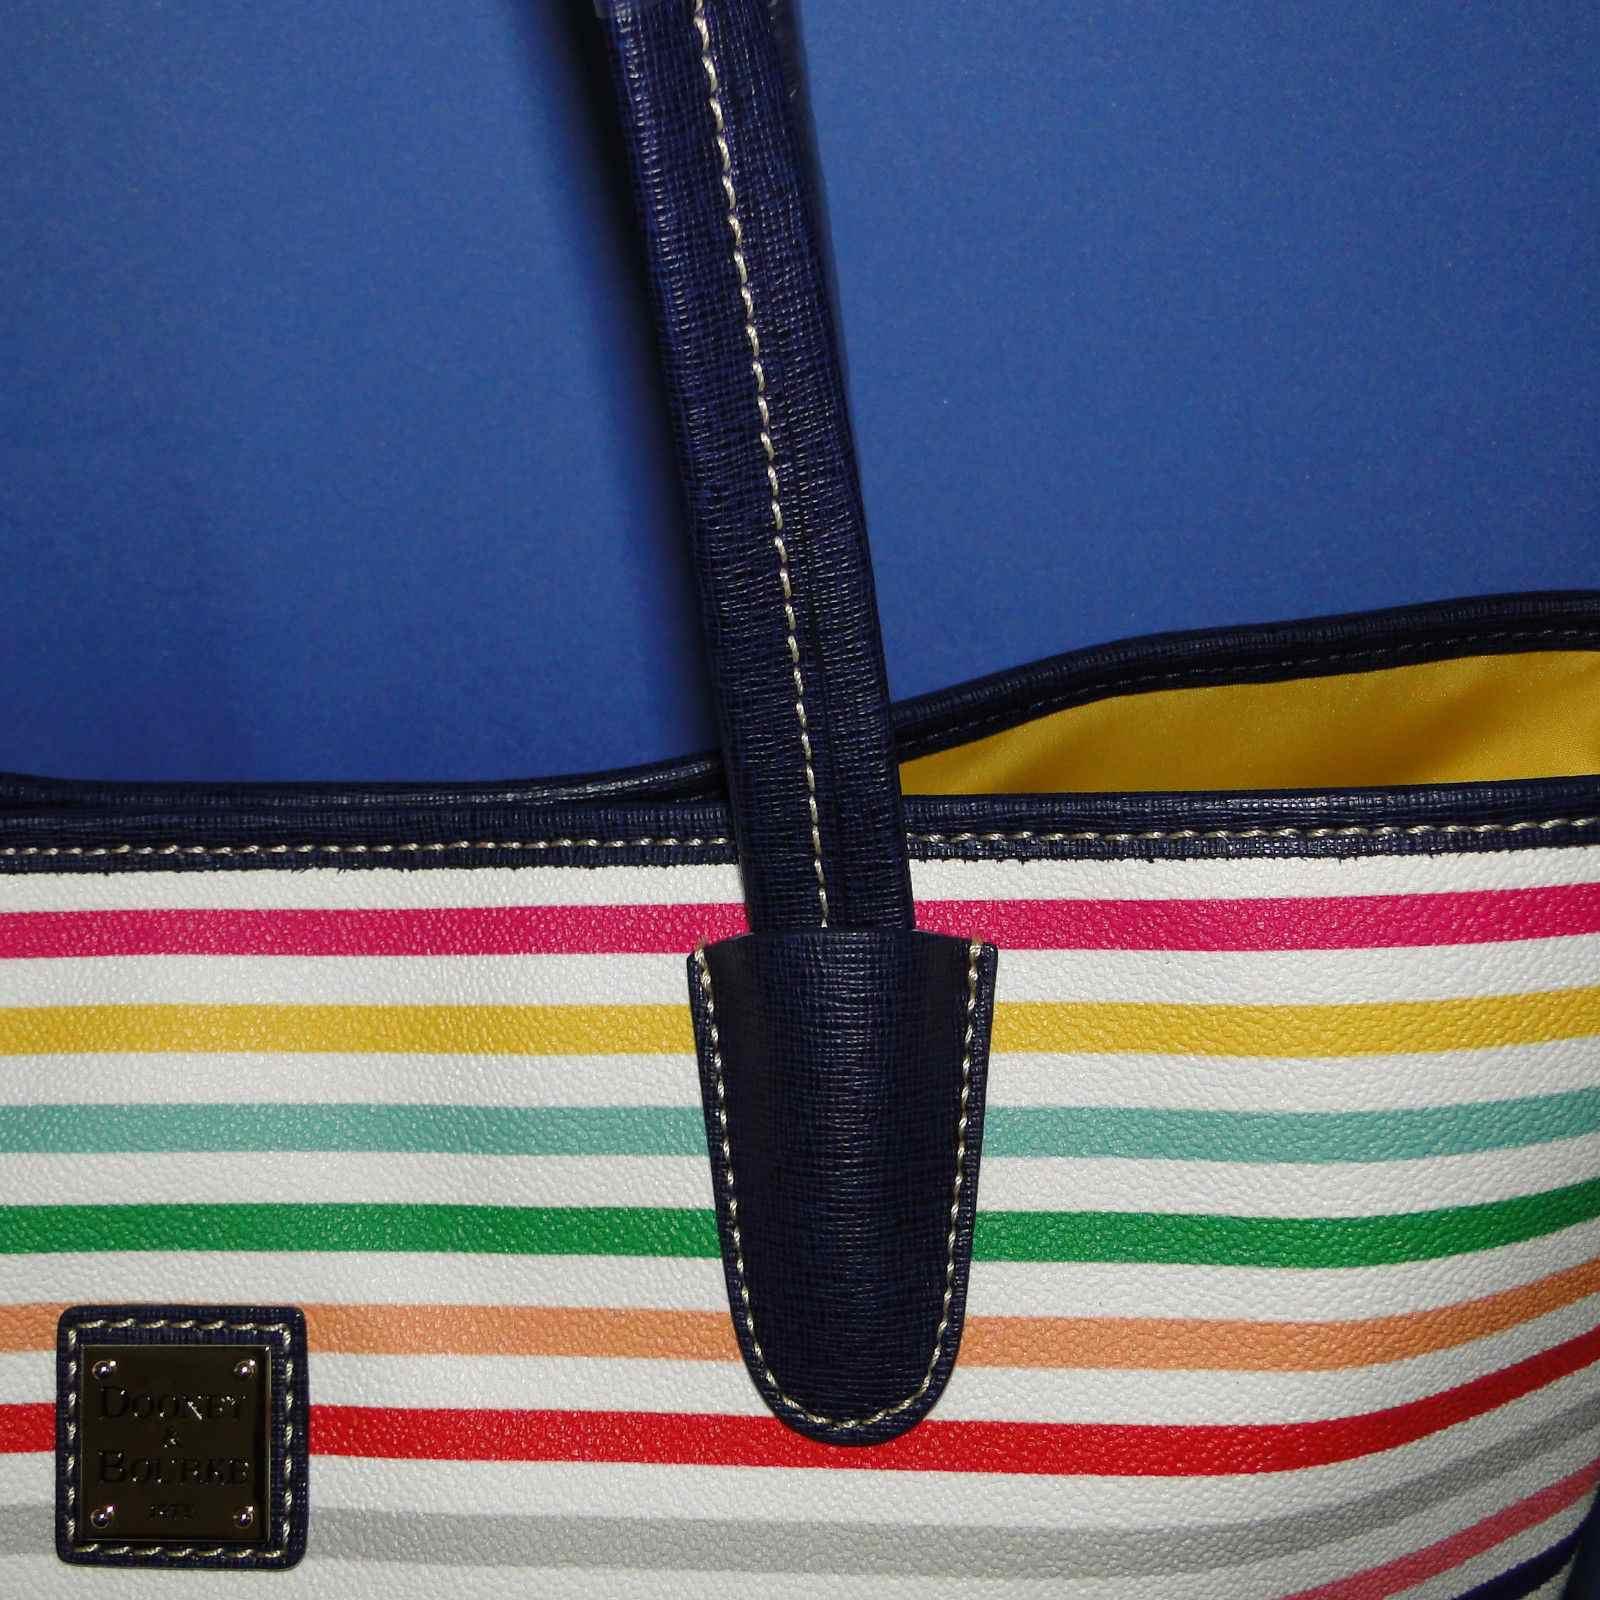 Dooney & Bourke Striped Lois Tote LG/ XL Multi Striped NWT OM729MU